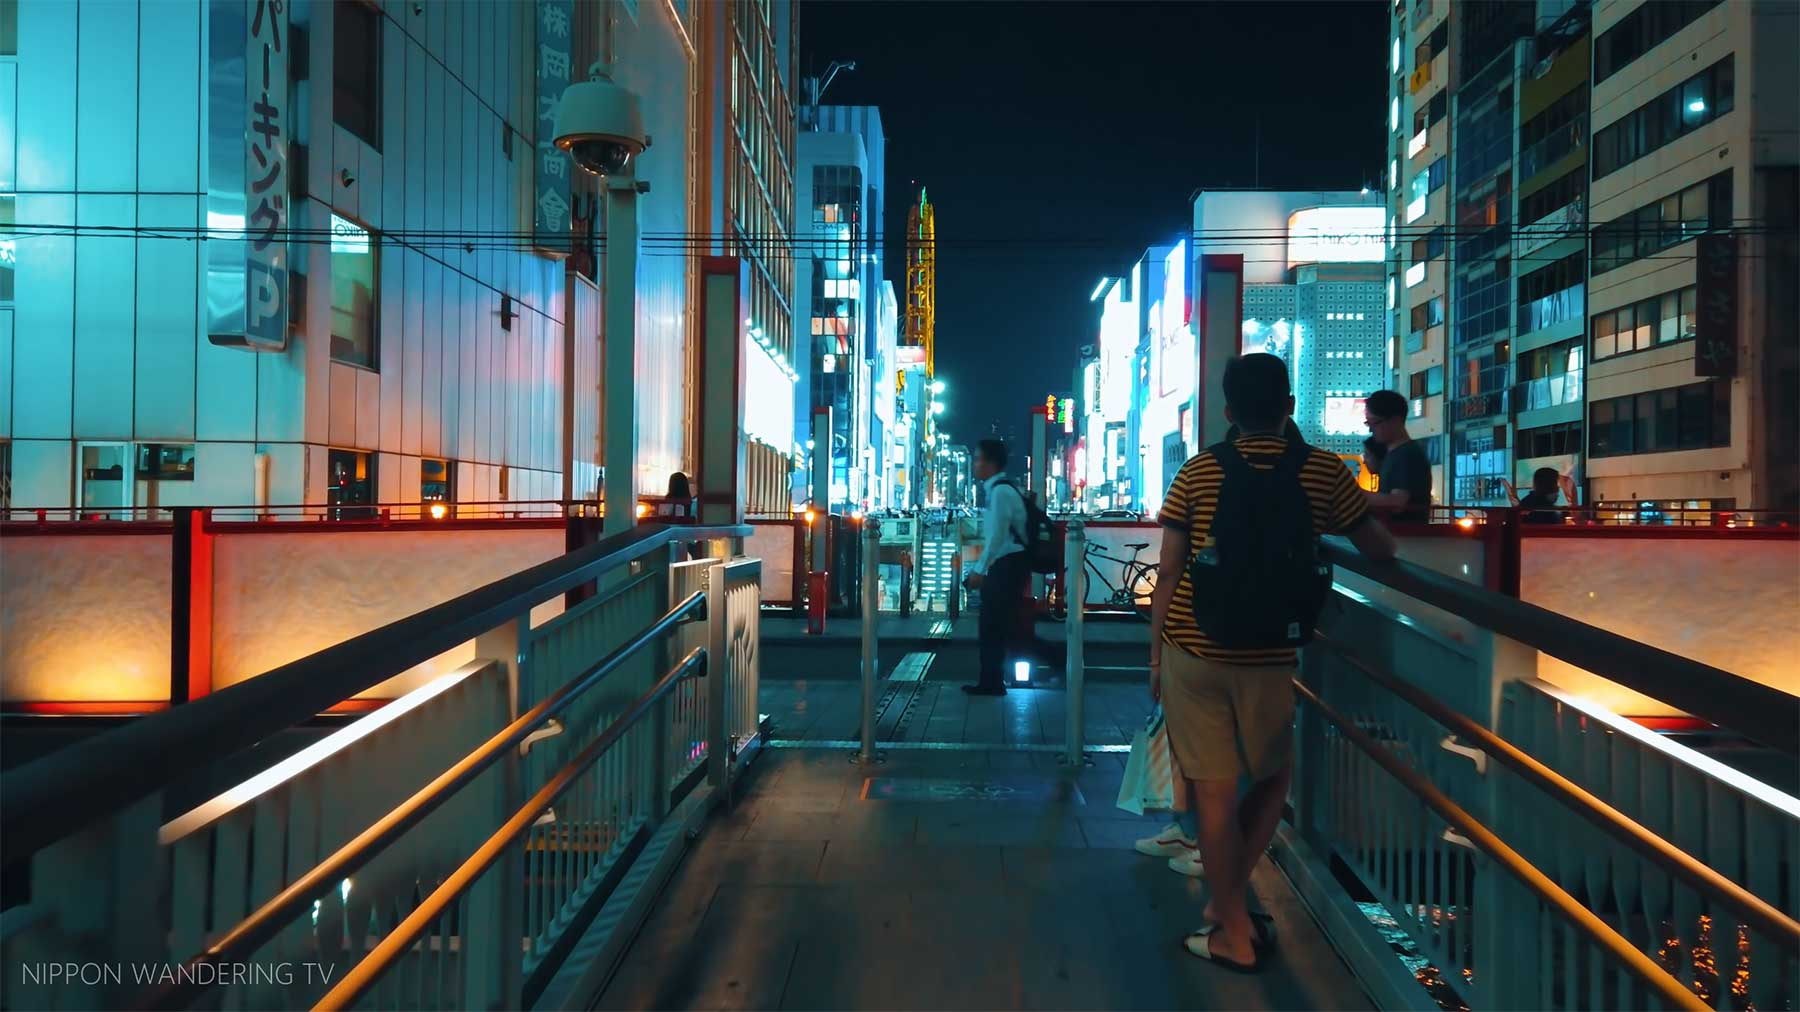 40-minütiger Spaziergang durch das nächtliche Osaka osaka-spaziergang